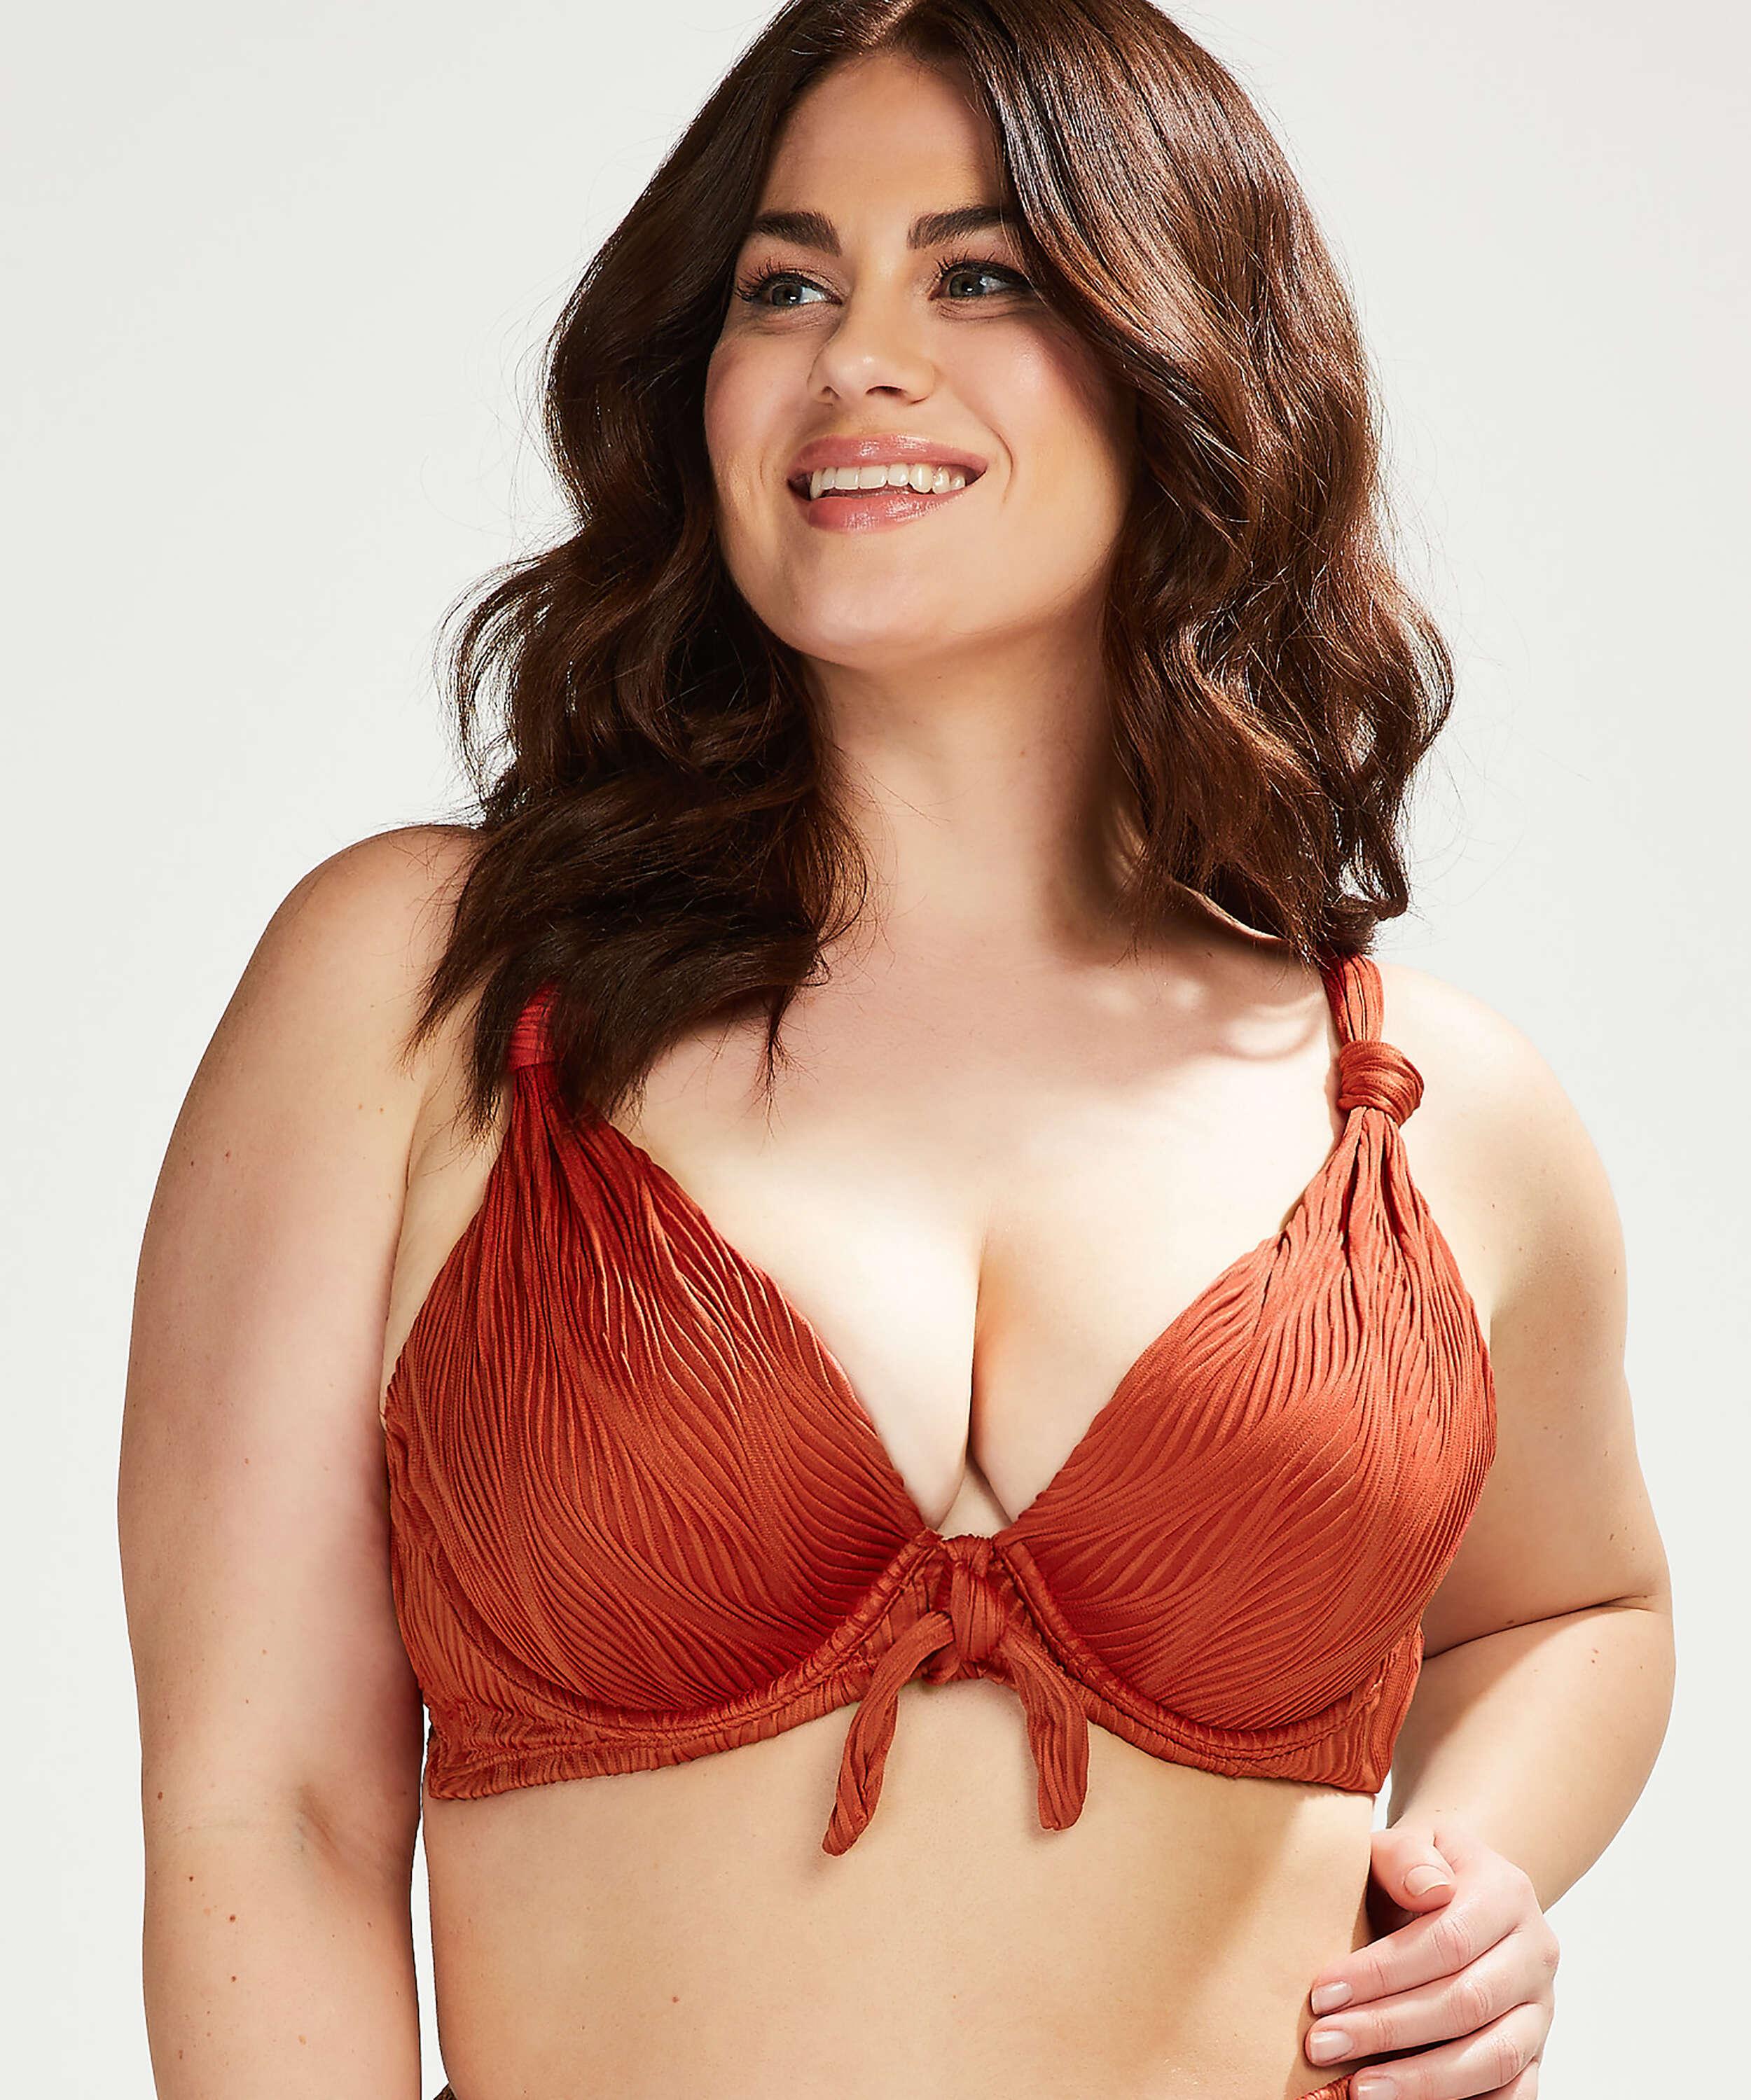 Vorgeformtes Bügel-Bikinioberteil Galibi I AM Danielle Cup E +, Orange, main